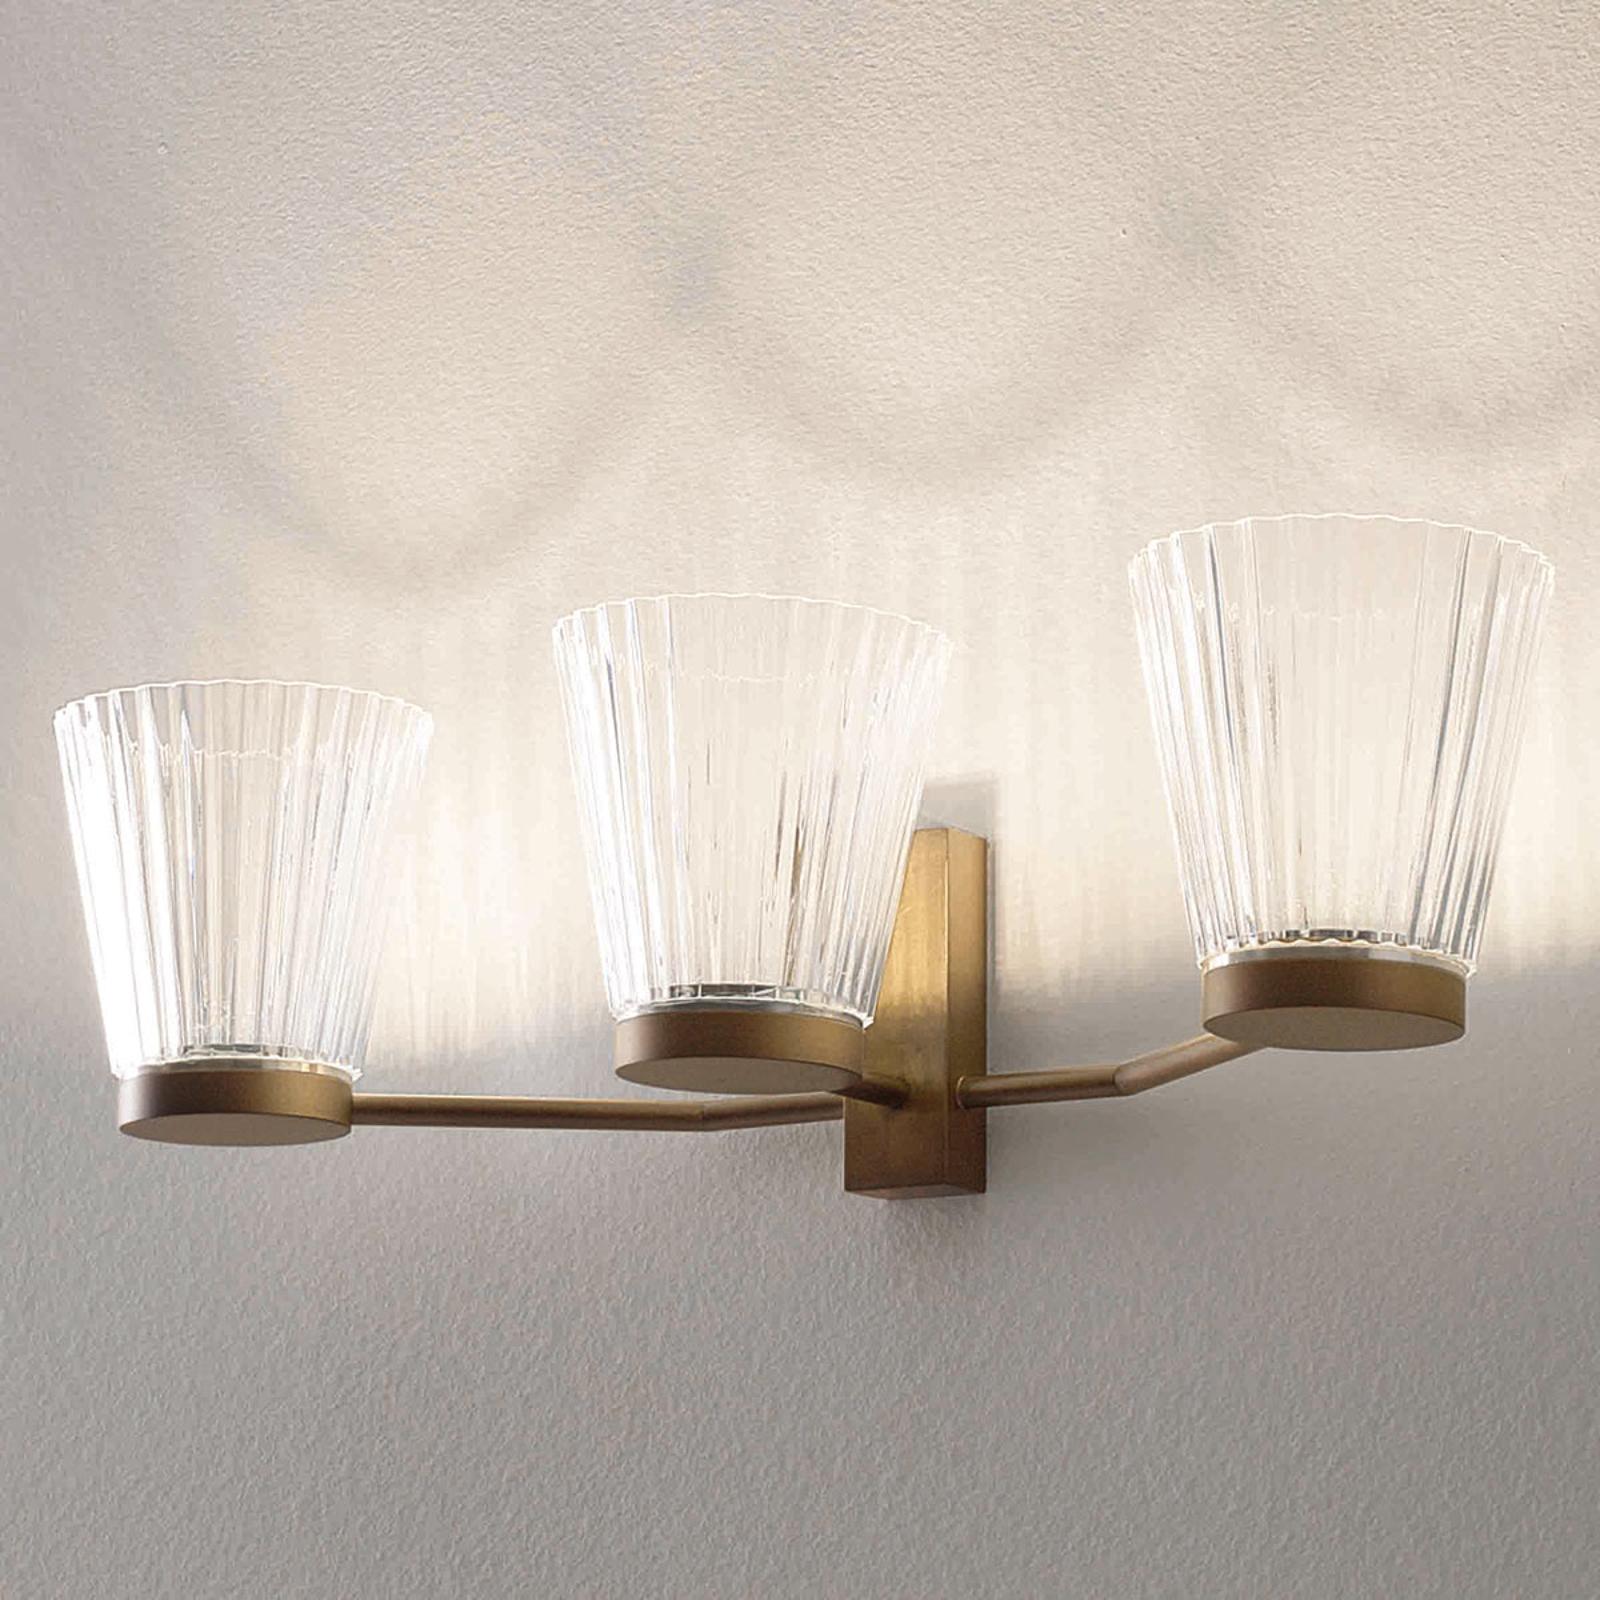 ICONE Canaletto - LED wandlamp, brons